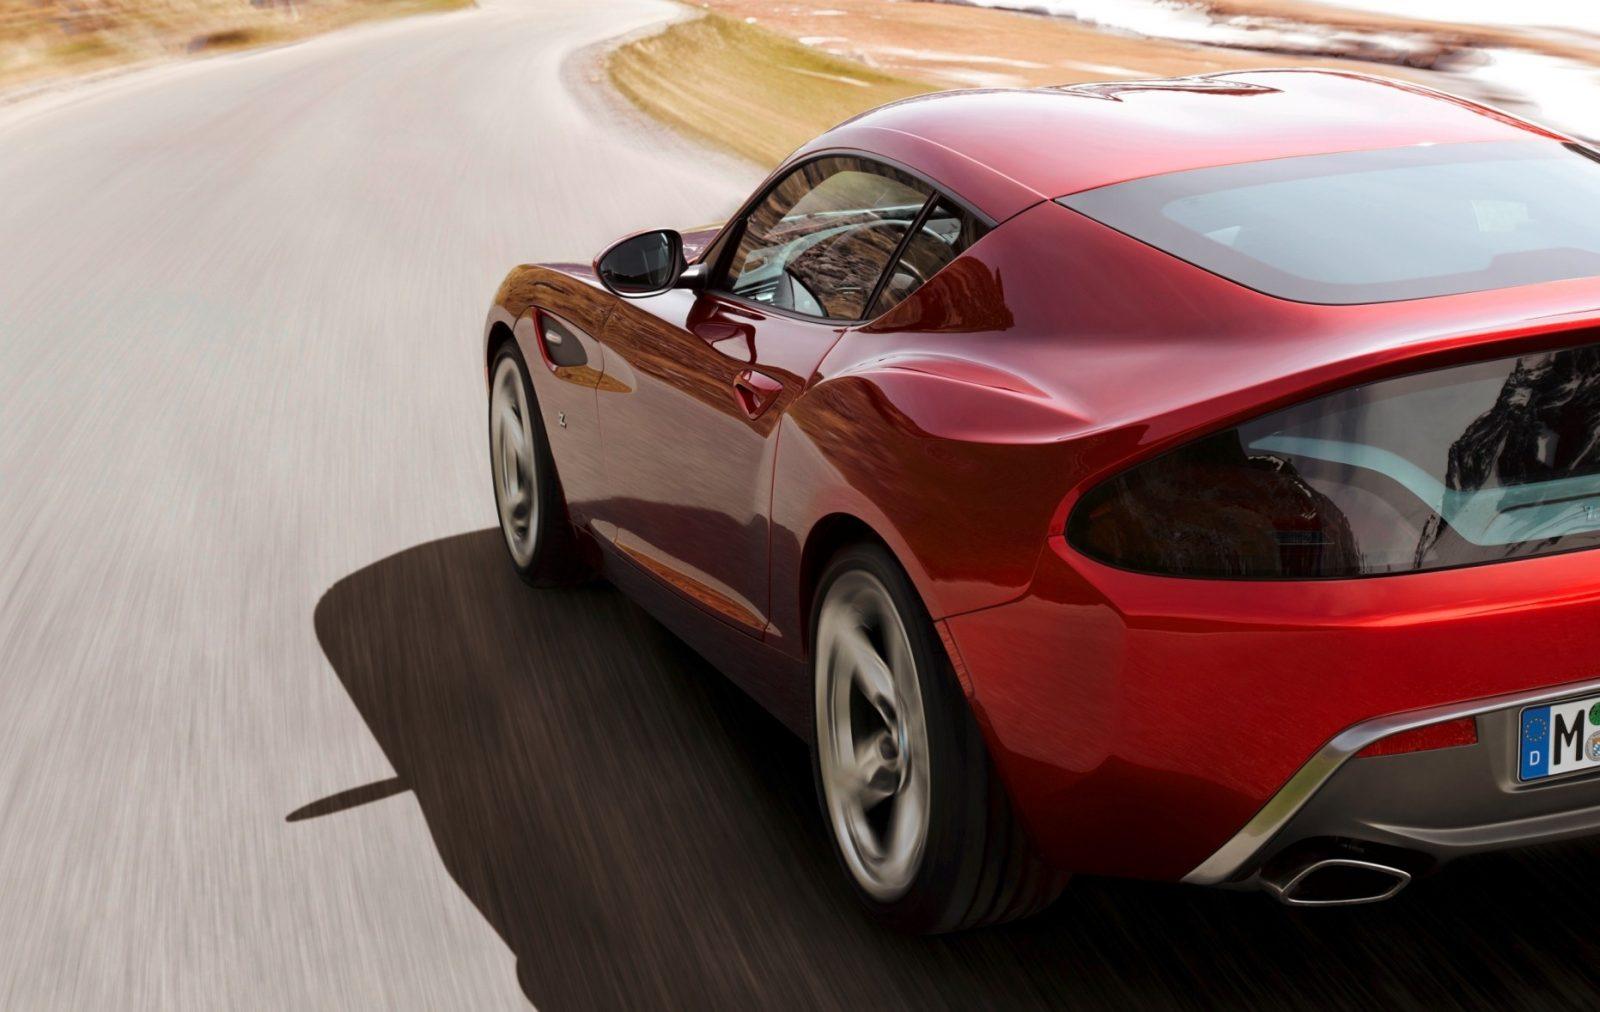 2012 Bmw Zagato Roadster Concept (48 Images) - New HD Car Wallpaper